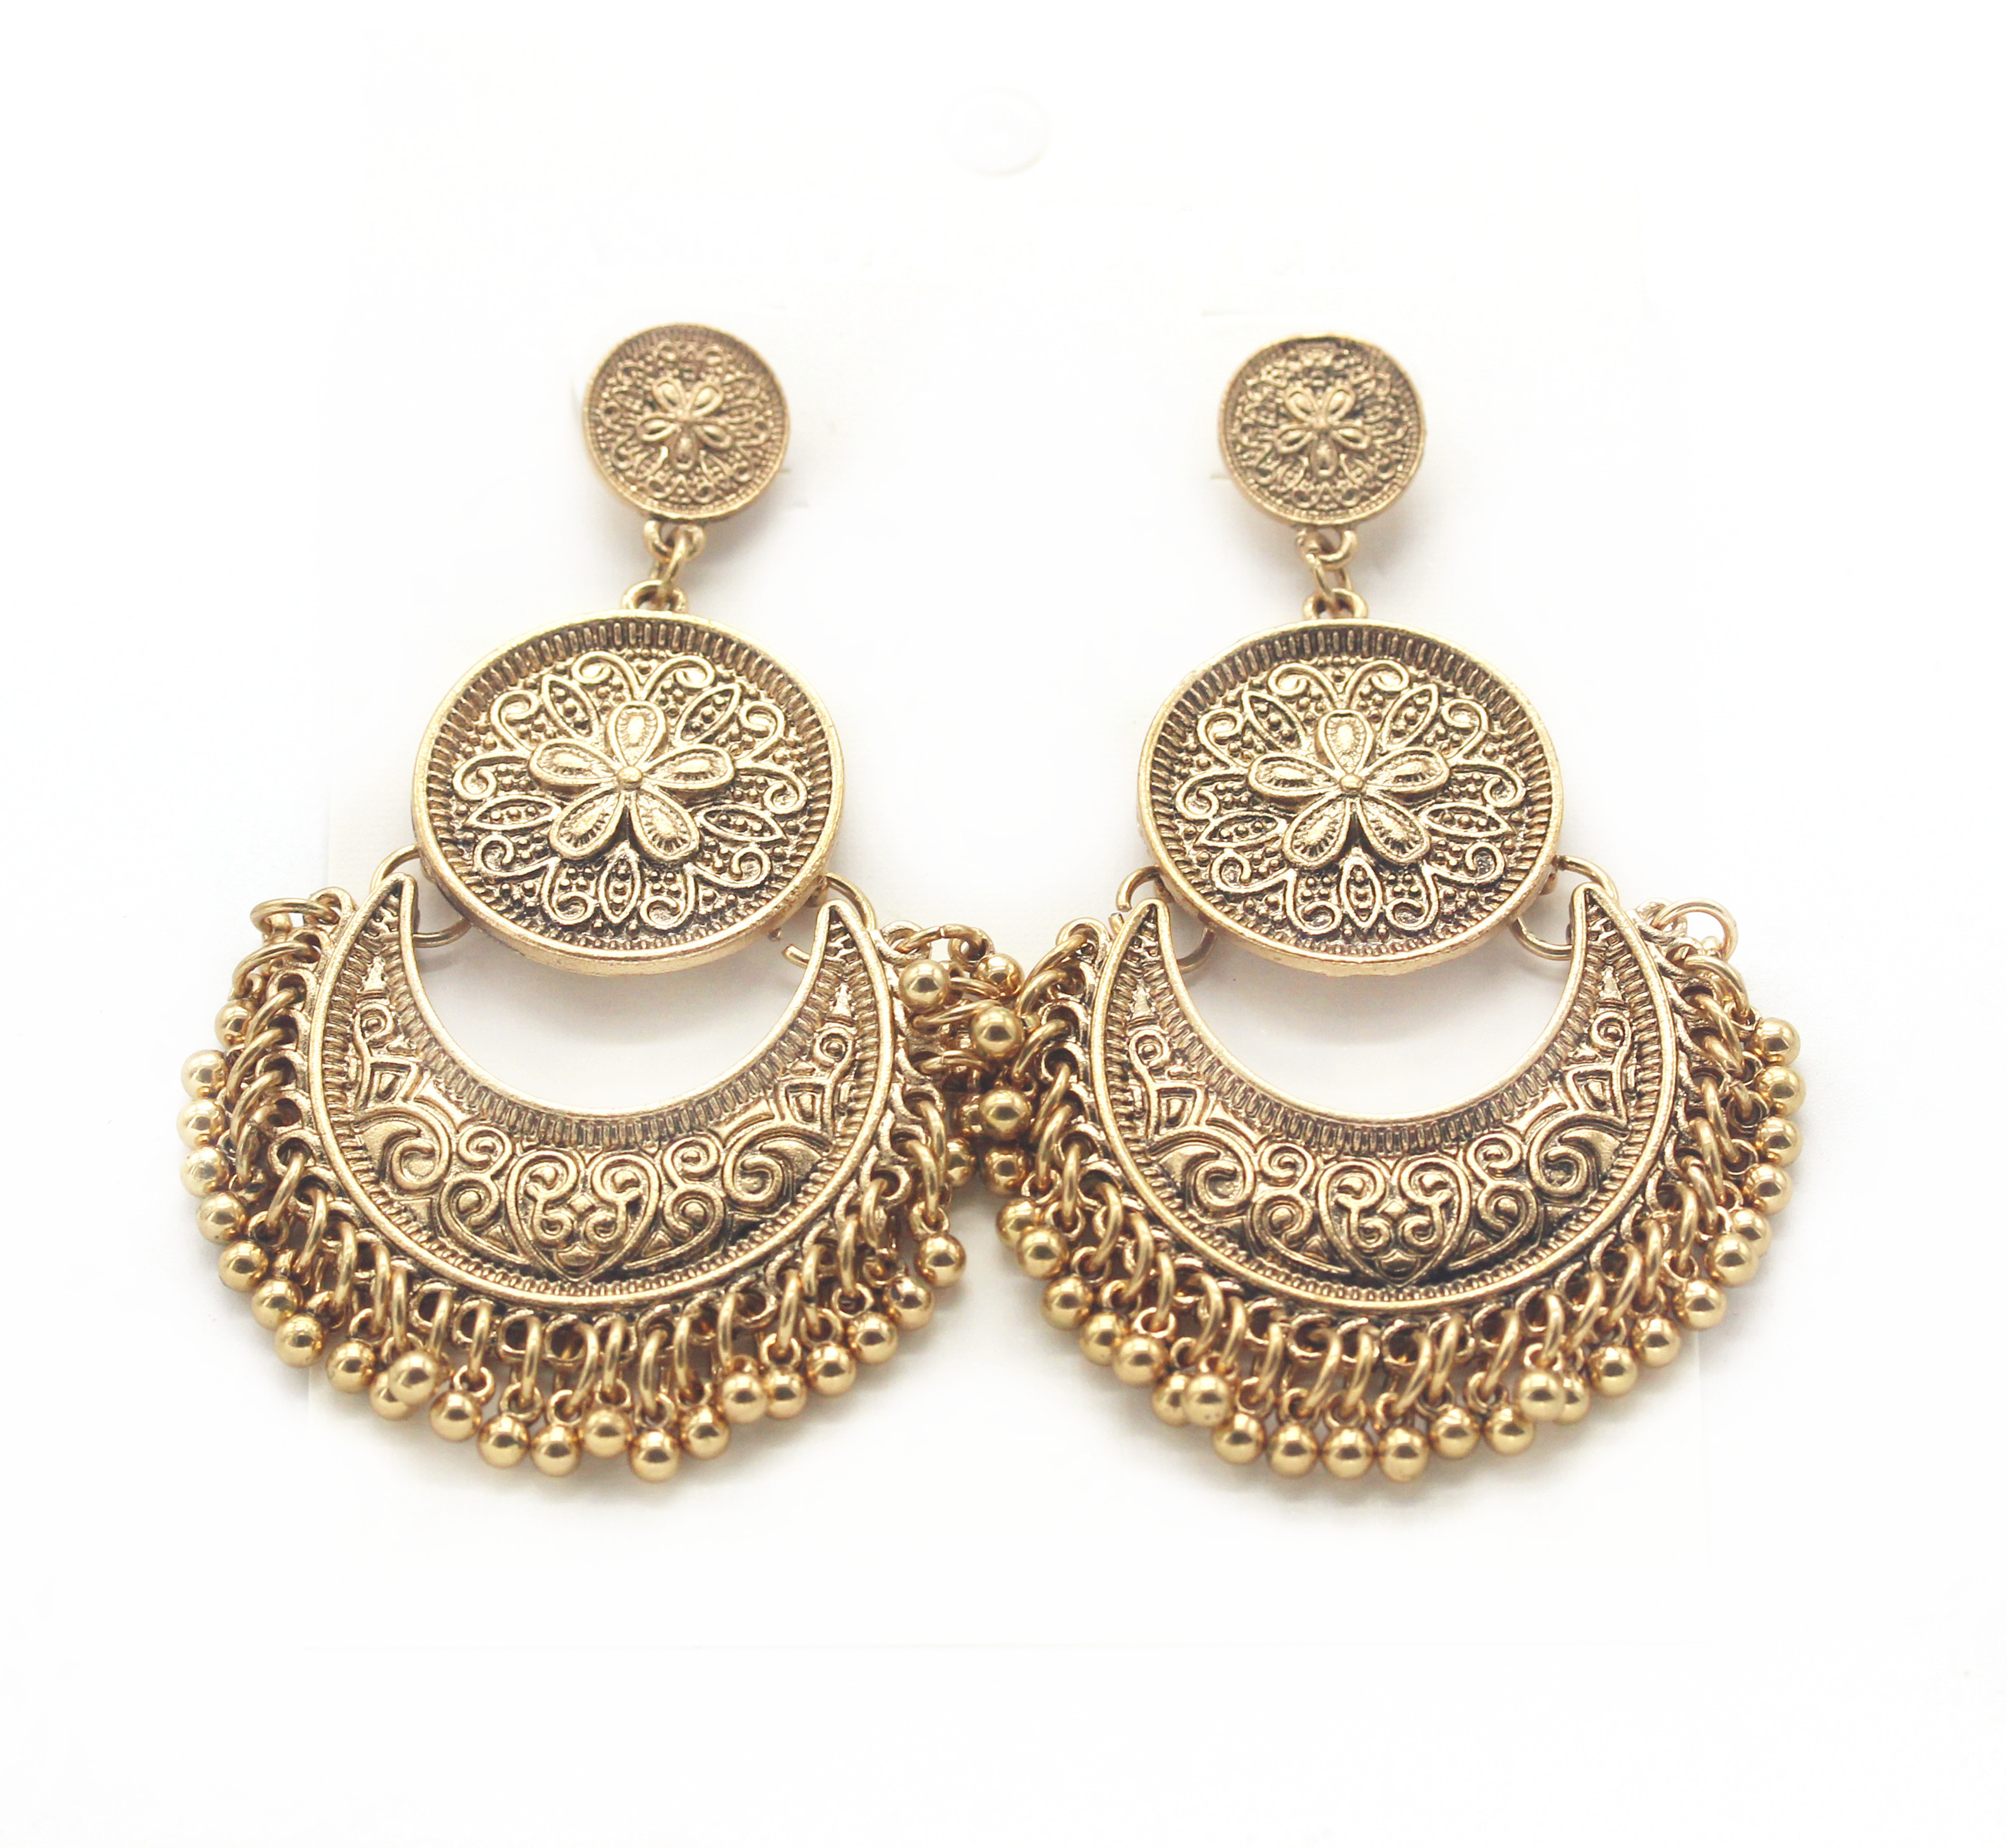 ahmed jewelry 2016 new zinc alloy vintage brand stud